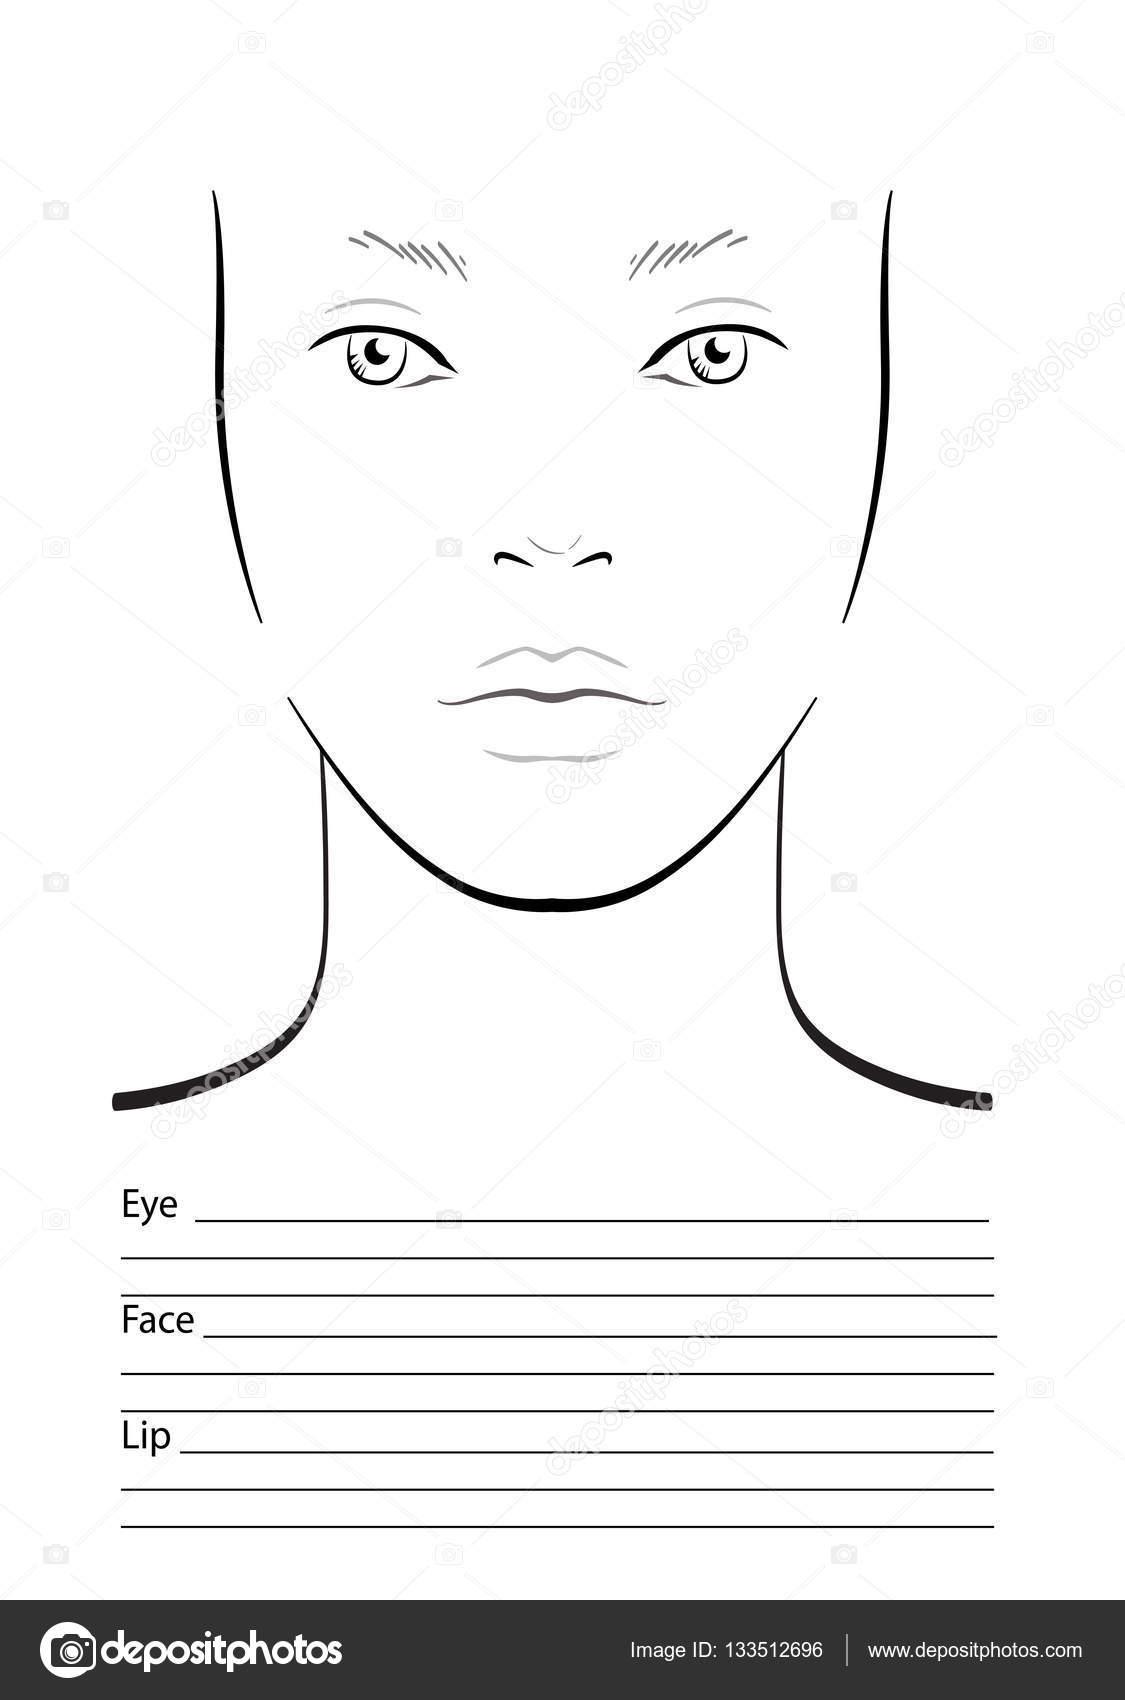 Ausmalbilder Ninjago Gesicht: Topmodel Ausmalbilder Gesicht